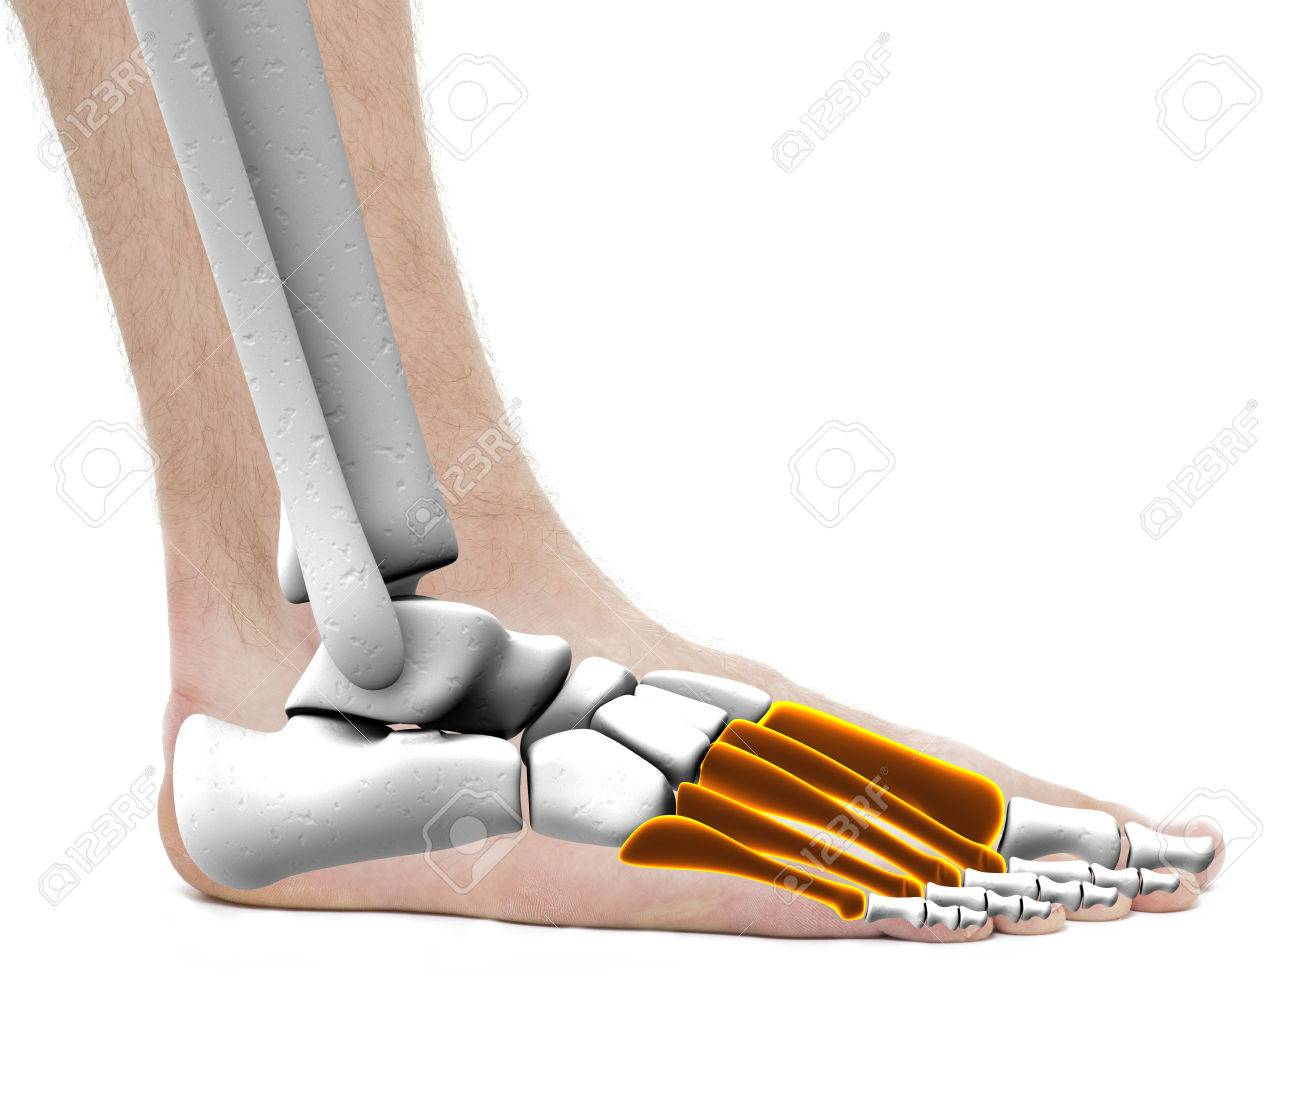 Metatarsal Bones - Anatomy Male - Studio Photo Isolated On White ...